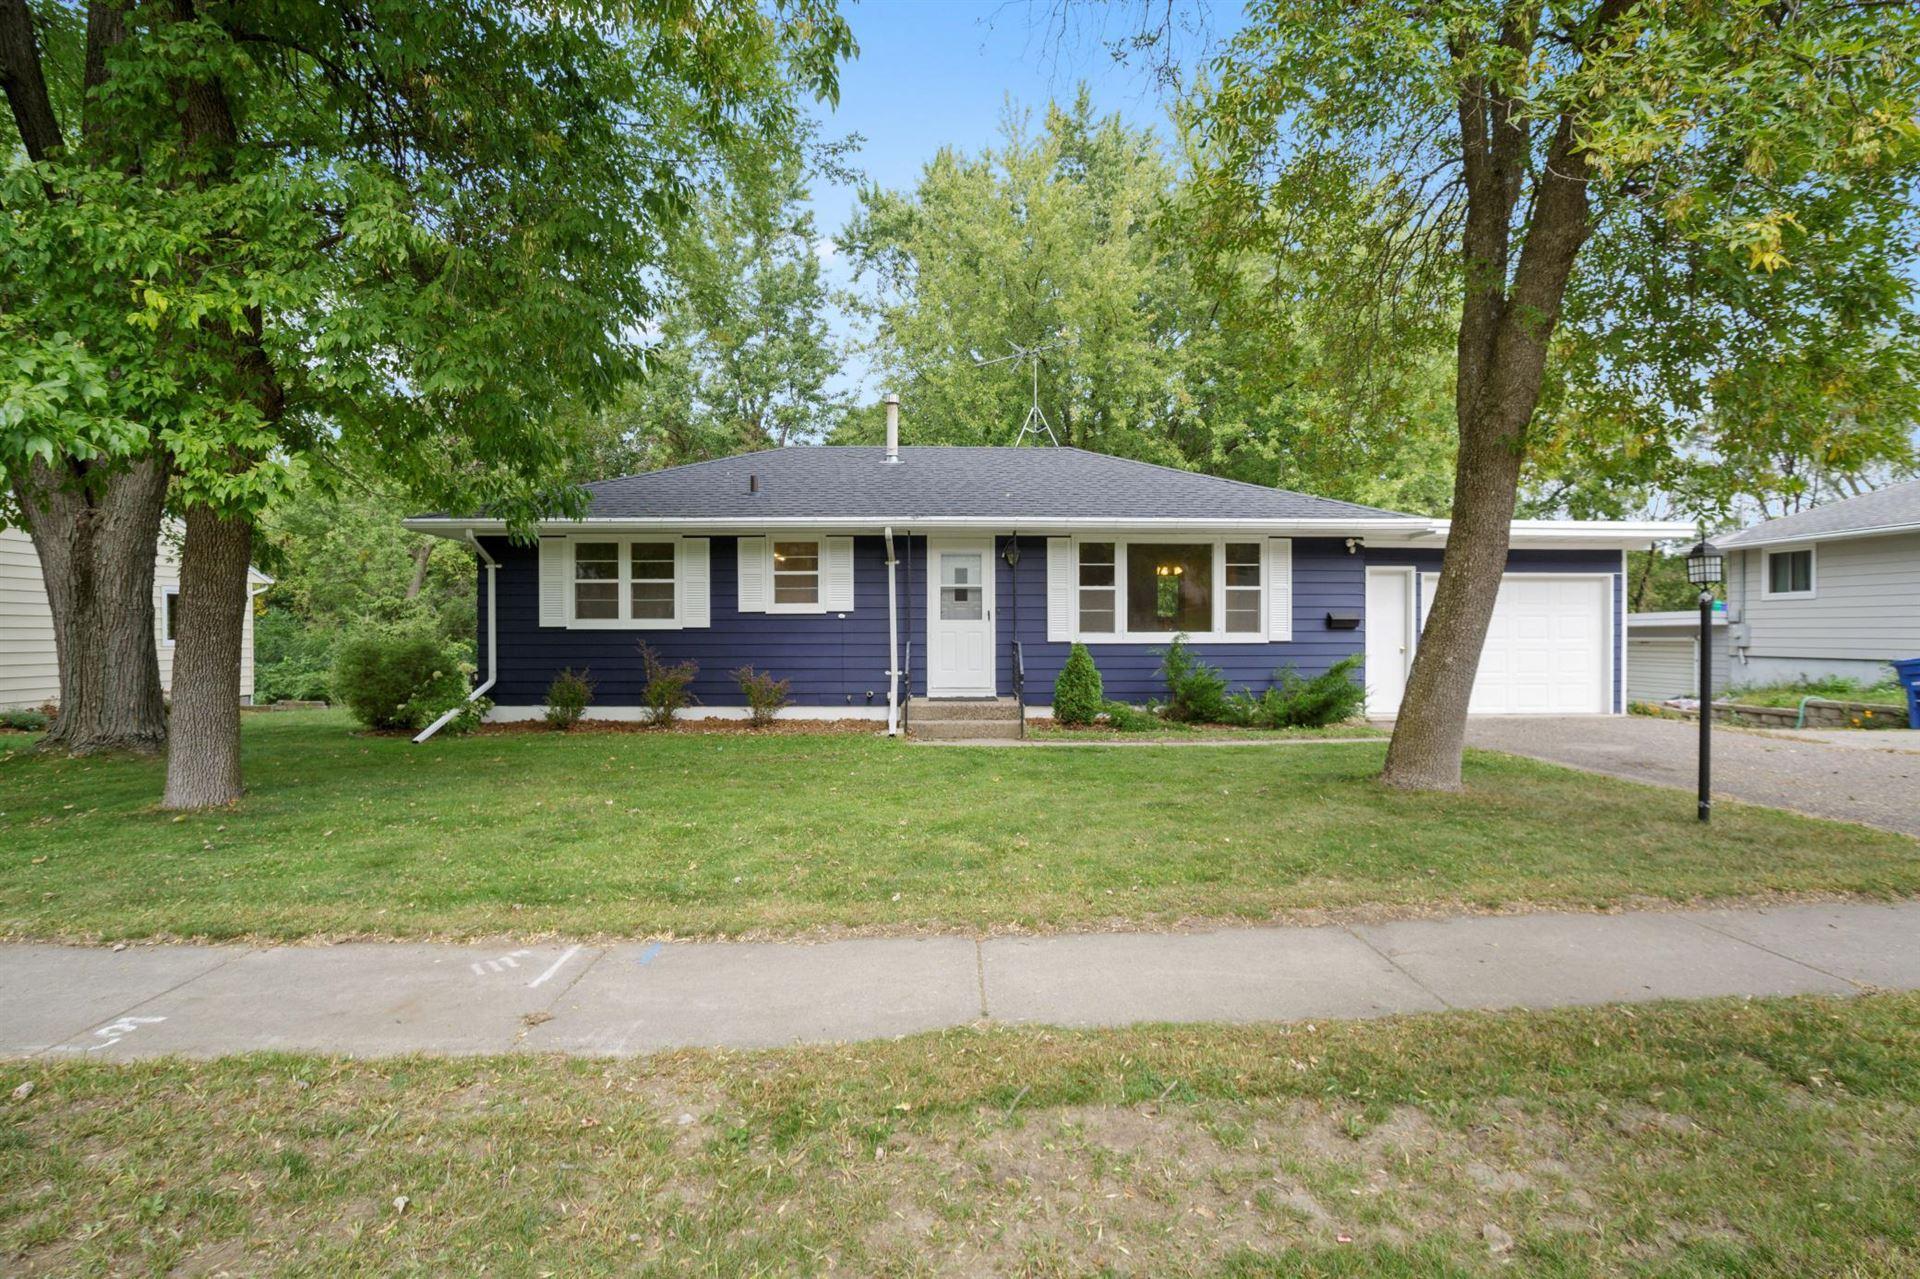 1344 W Maple Avenue, Red Wing, MN 55066 - MLS#: 5660919